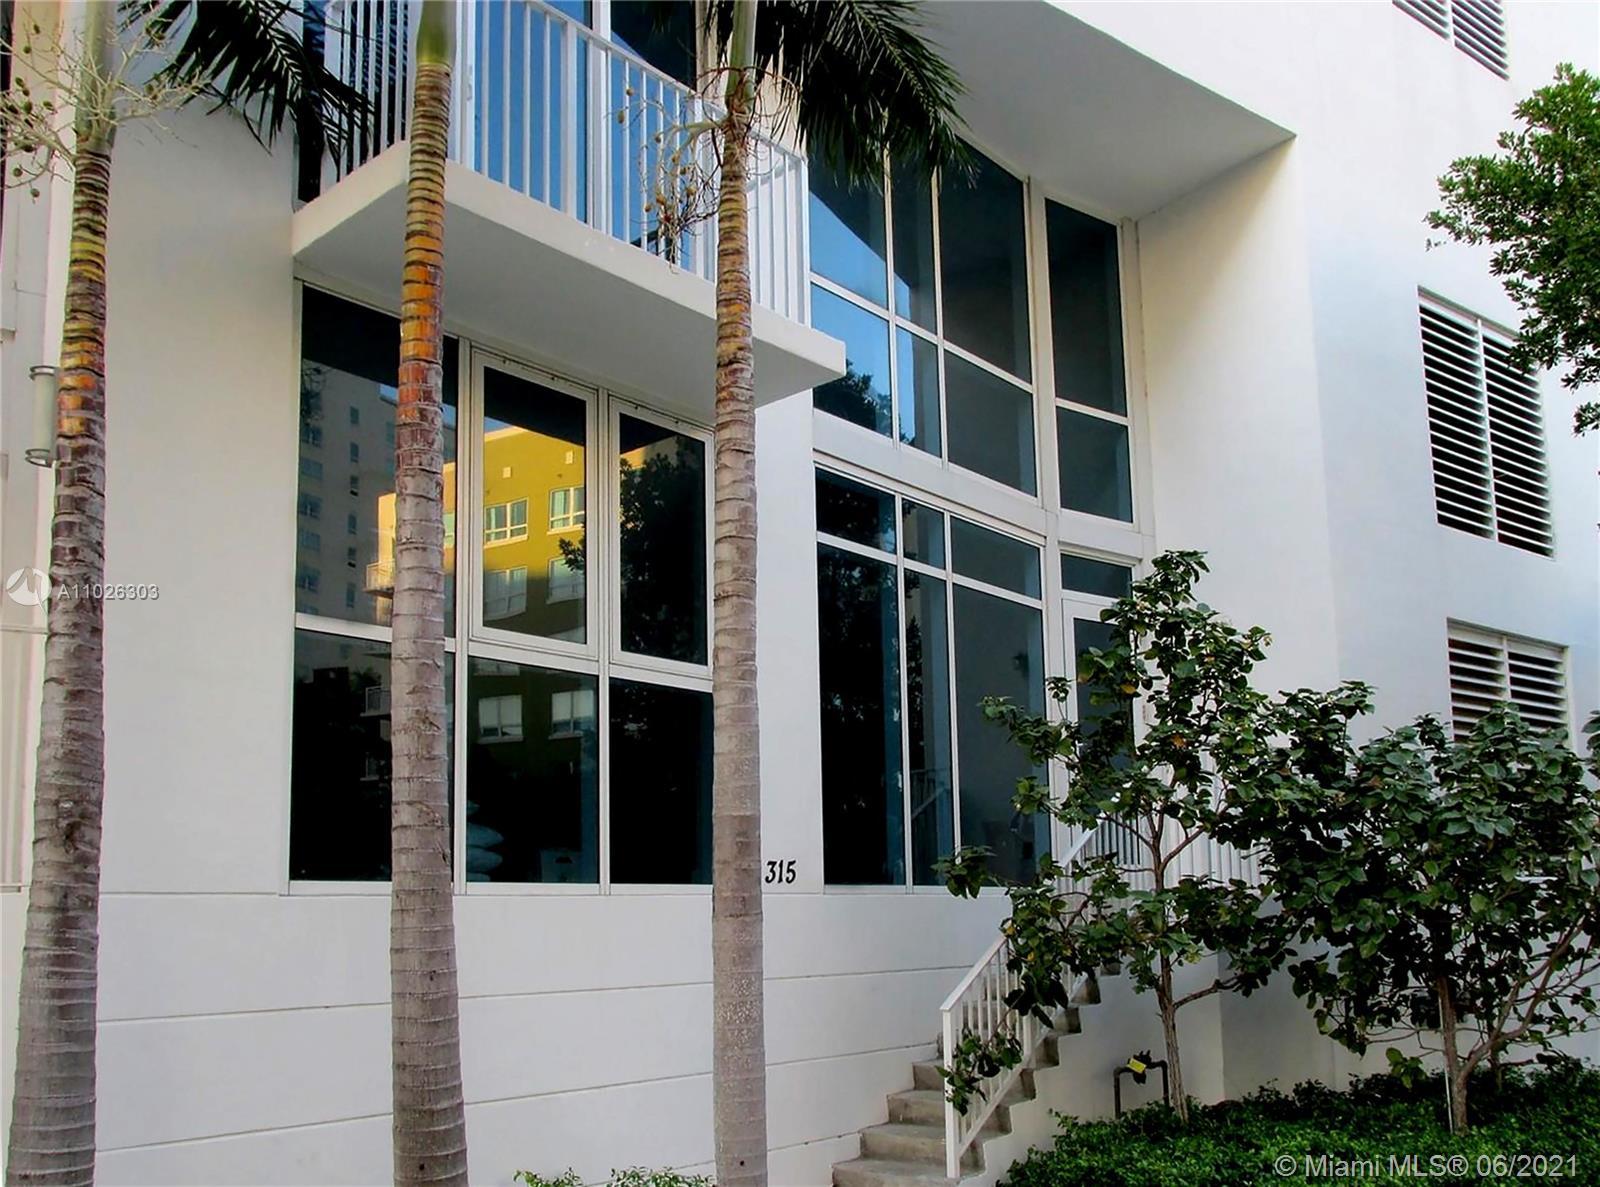 Paramount Bay #TH 315/101 - 2020 N Bayshore Dr #TH 315/101, Miami, FL 33137